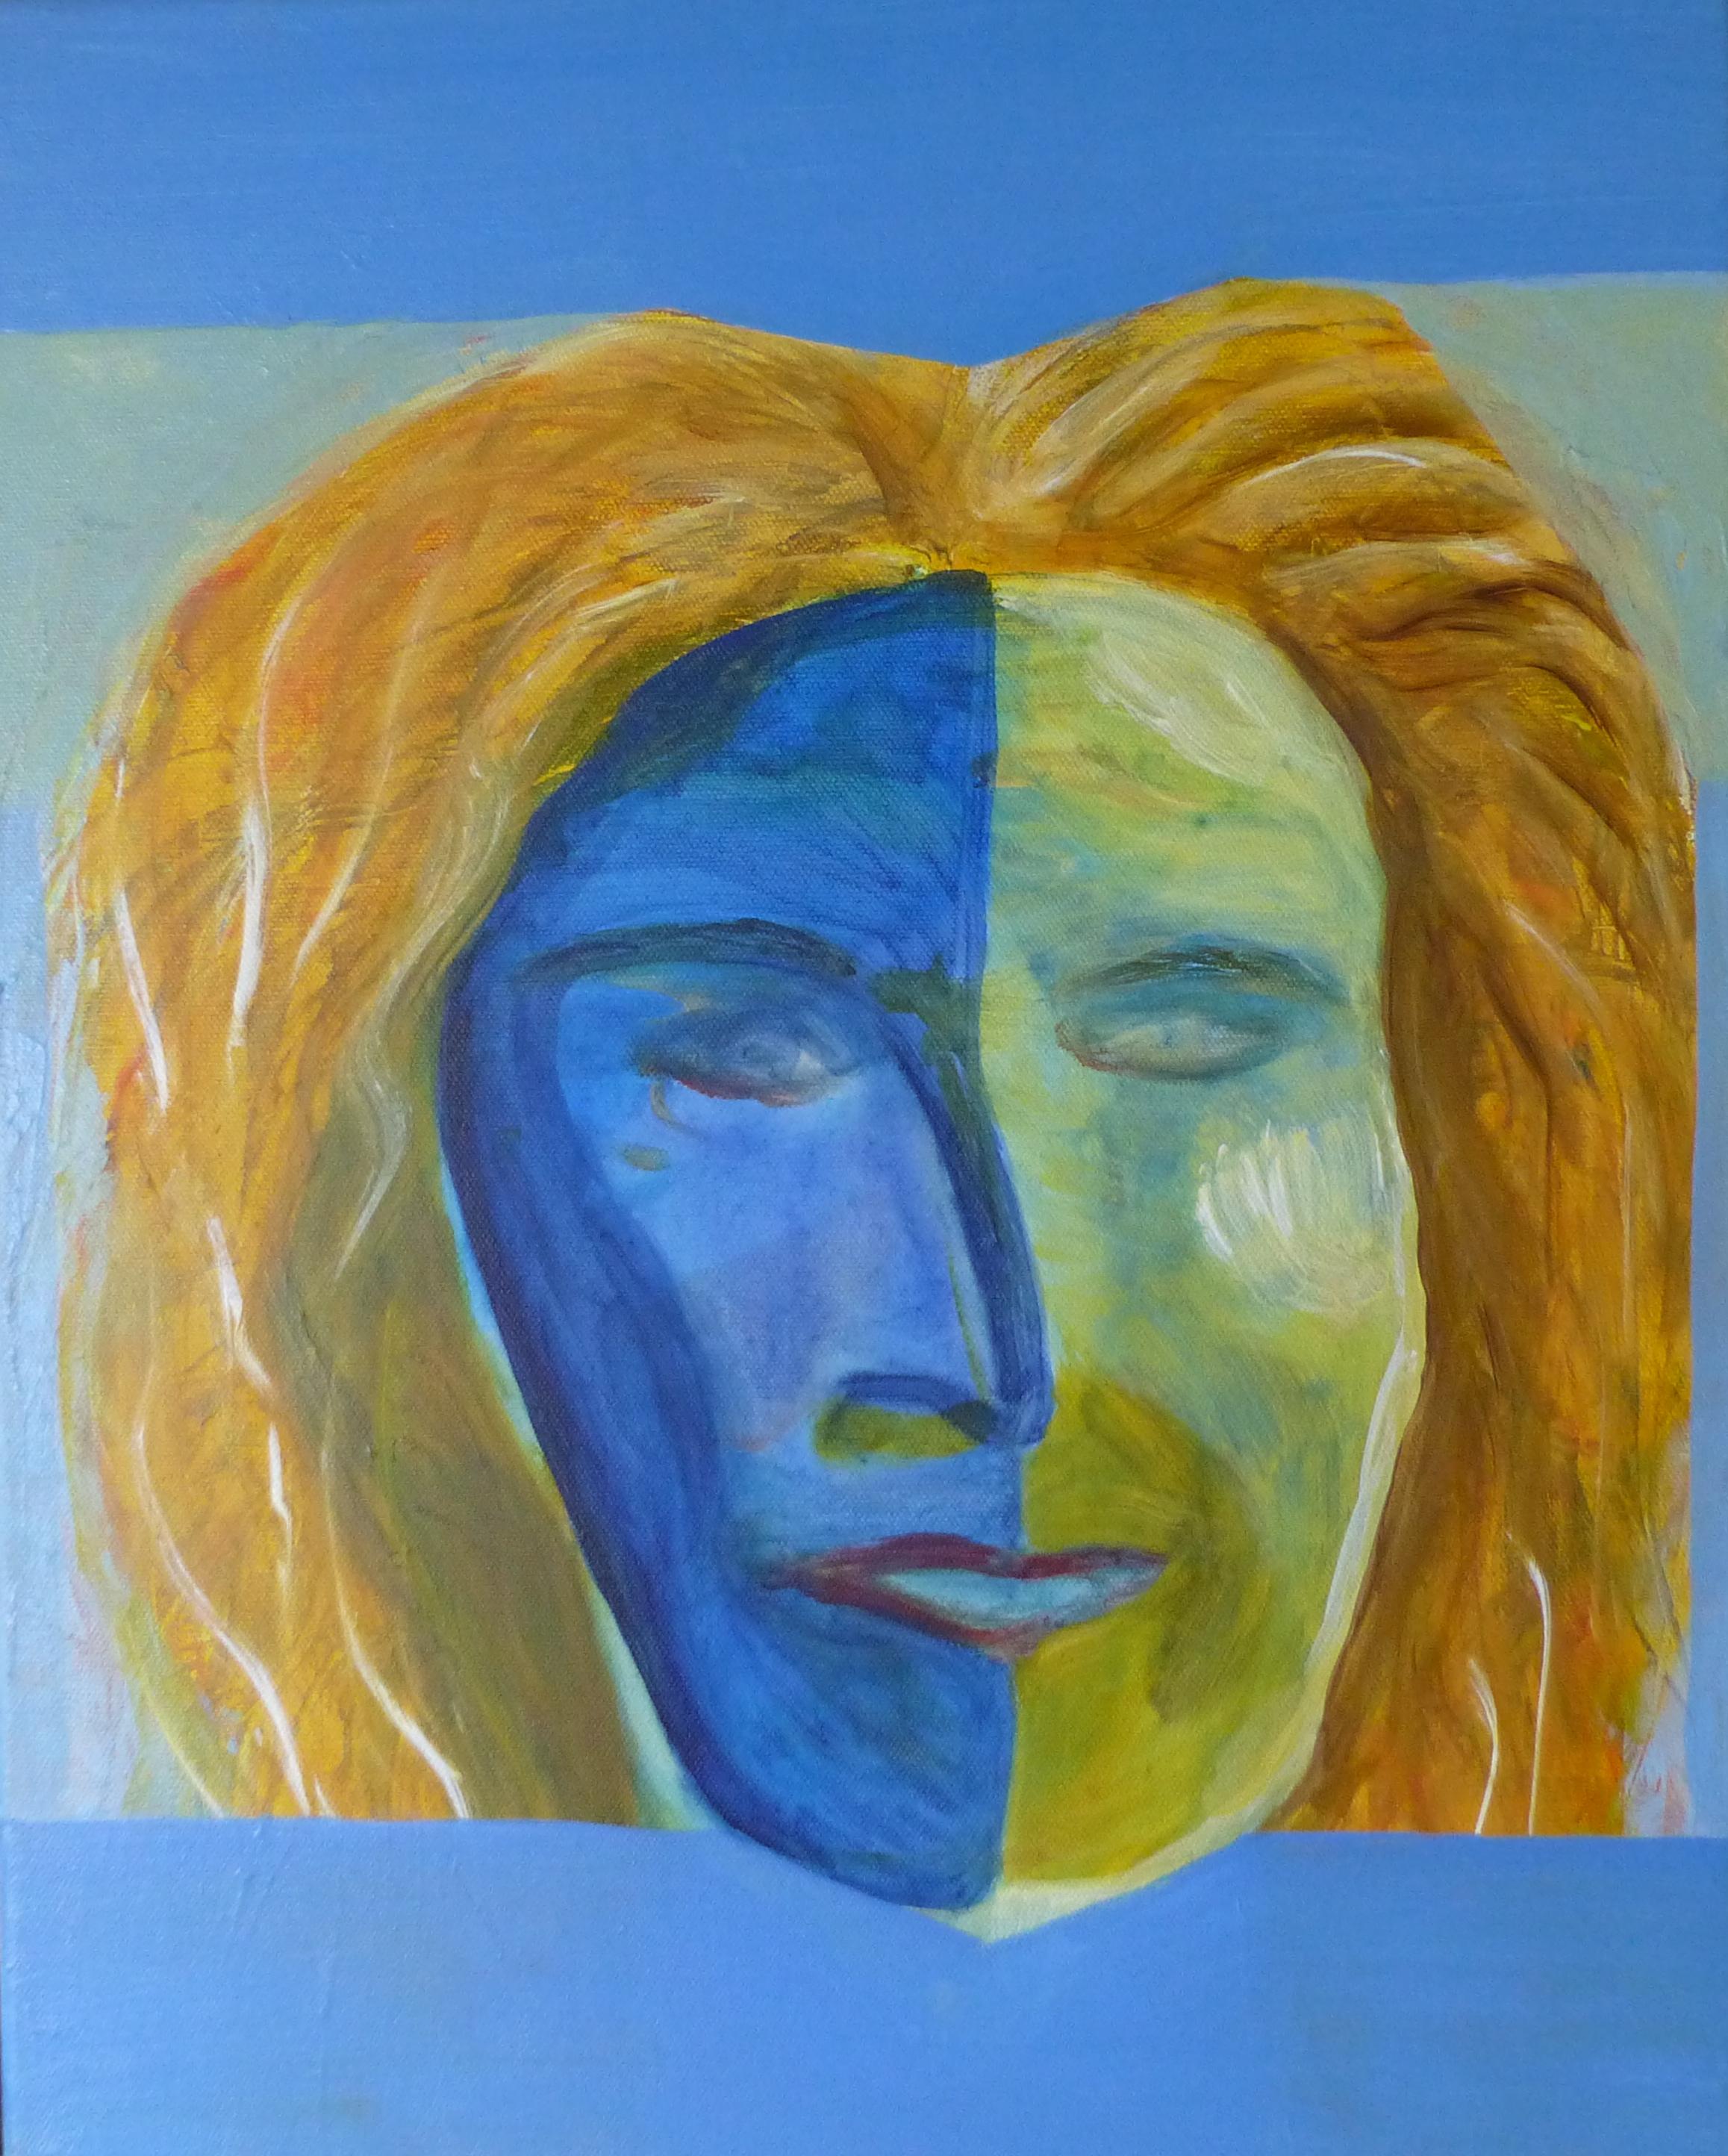 Selbstportrait, 2012